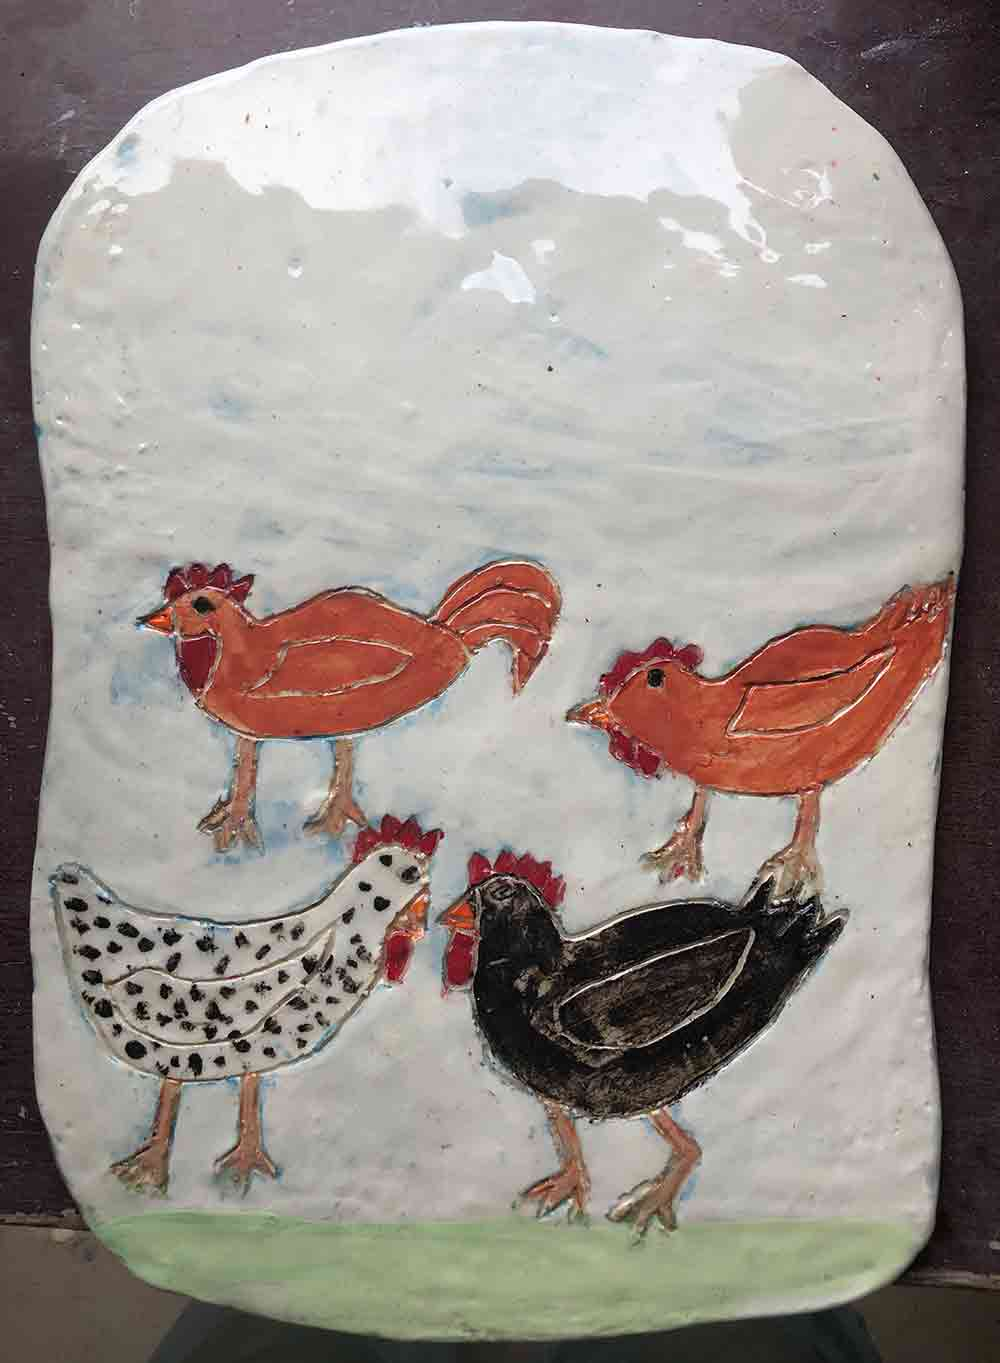 Chook Platter ceramic Zion Levy Stewart Paintings and Ceramics Mullumbimby Australia